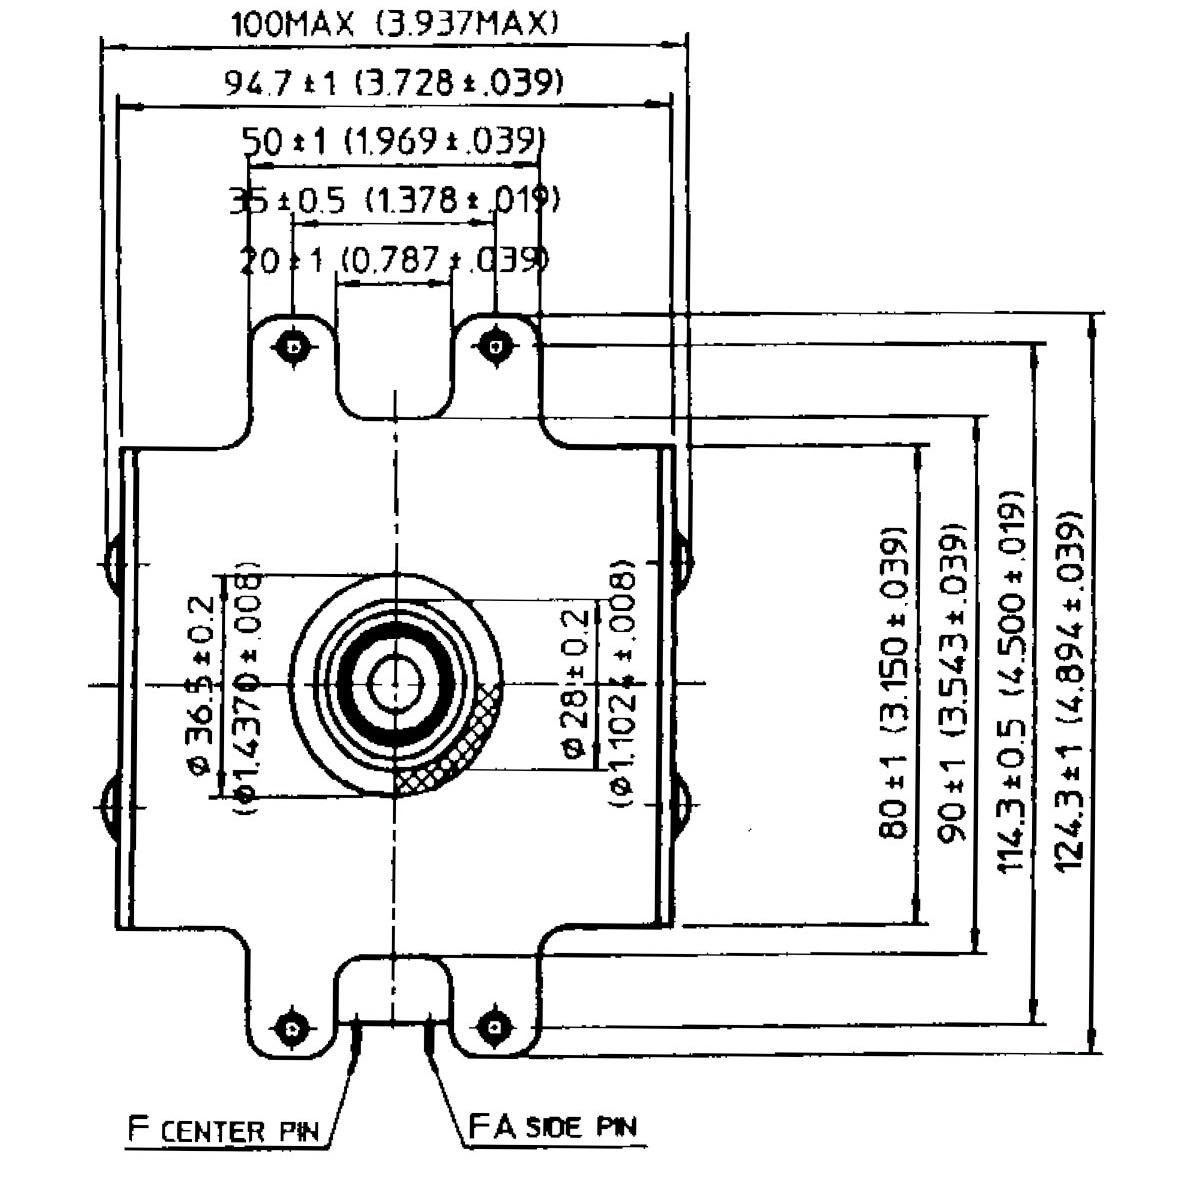 1 25kw 1250w Magnetron Microwave Yj1540